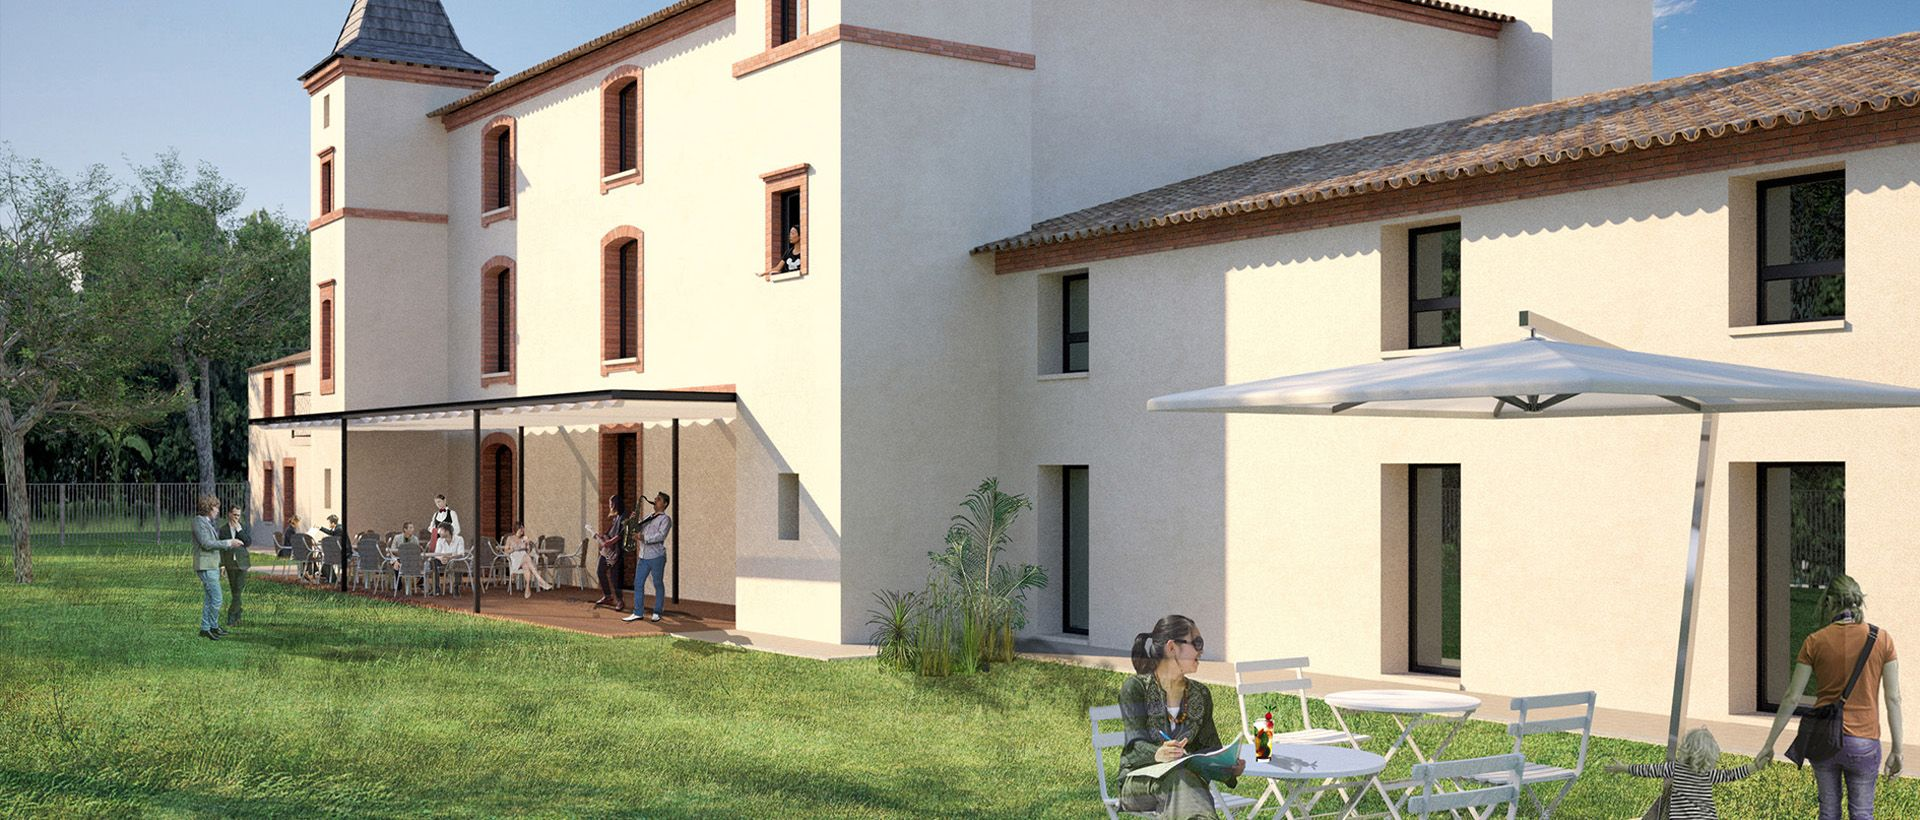 Seuil-architecture-ERP-hebergement-tourisme-Mounede-slid2